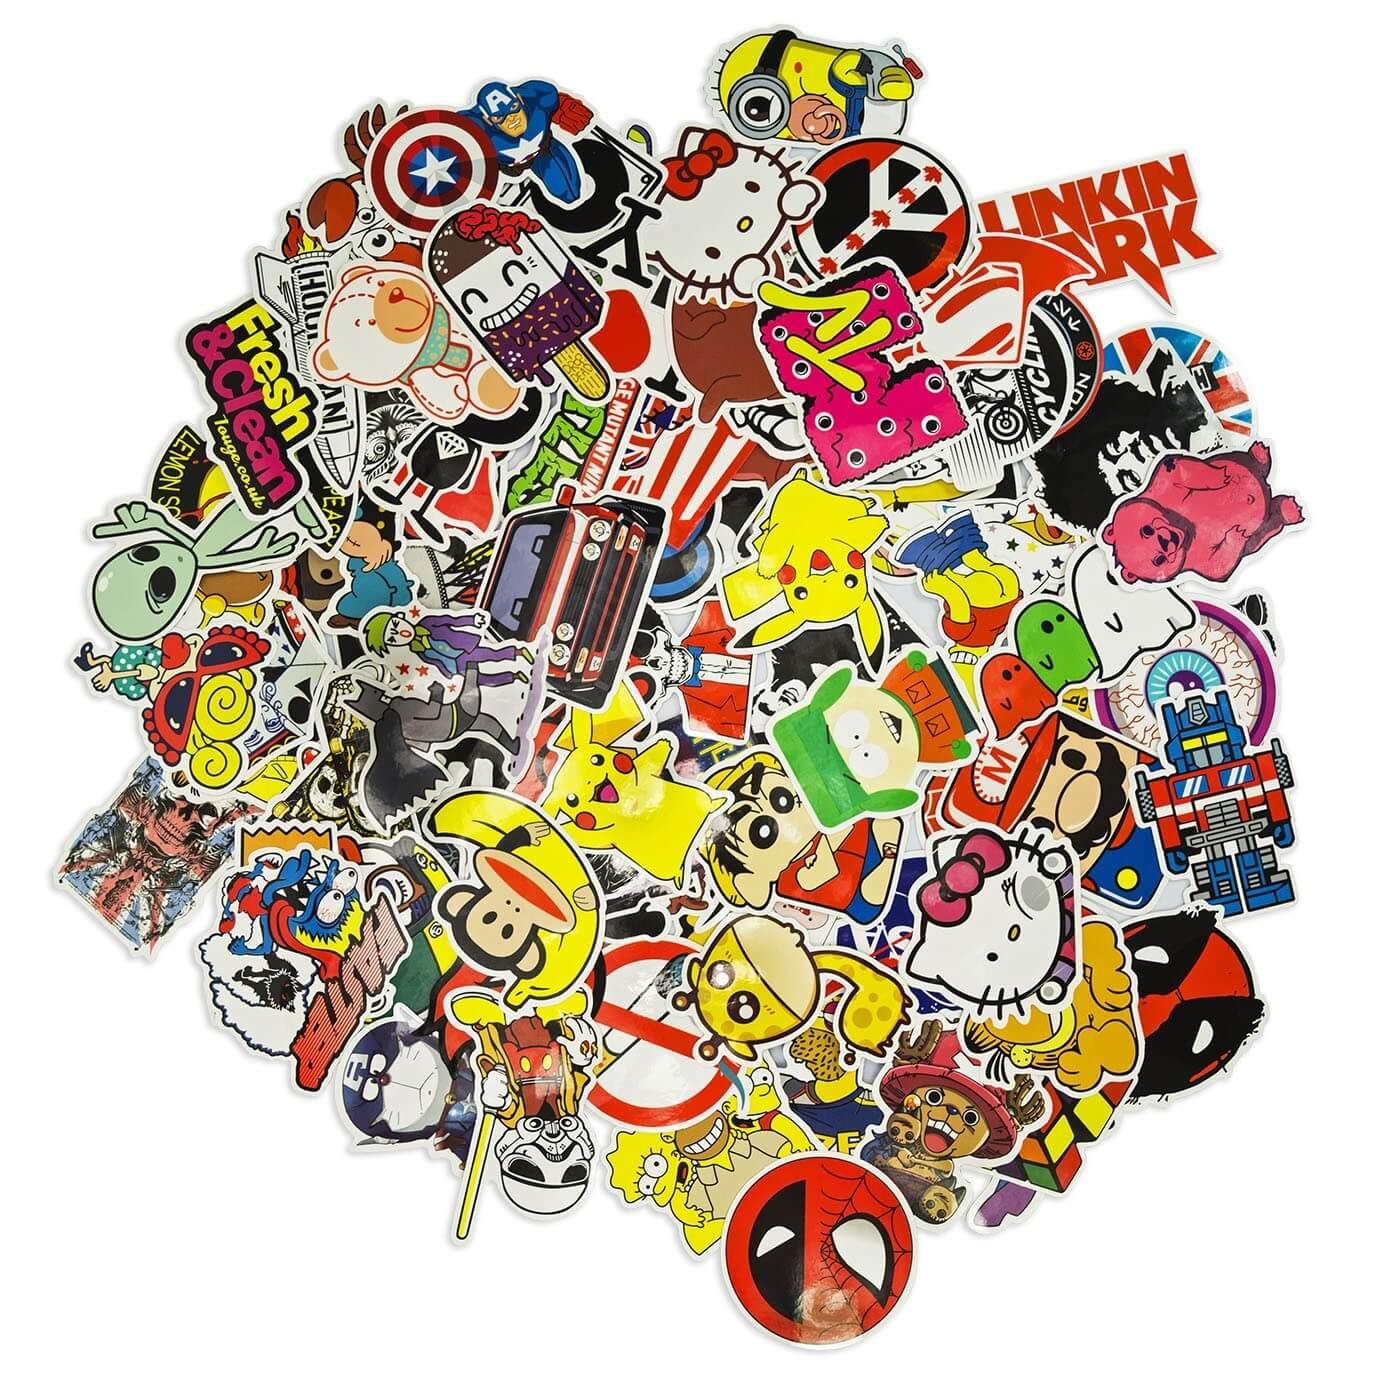 100 aufkleber sticker bomb retro graffiti style tuning logos marken decal set 4